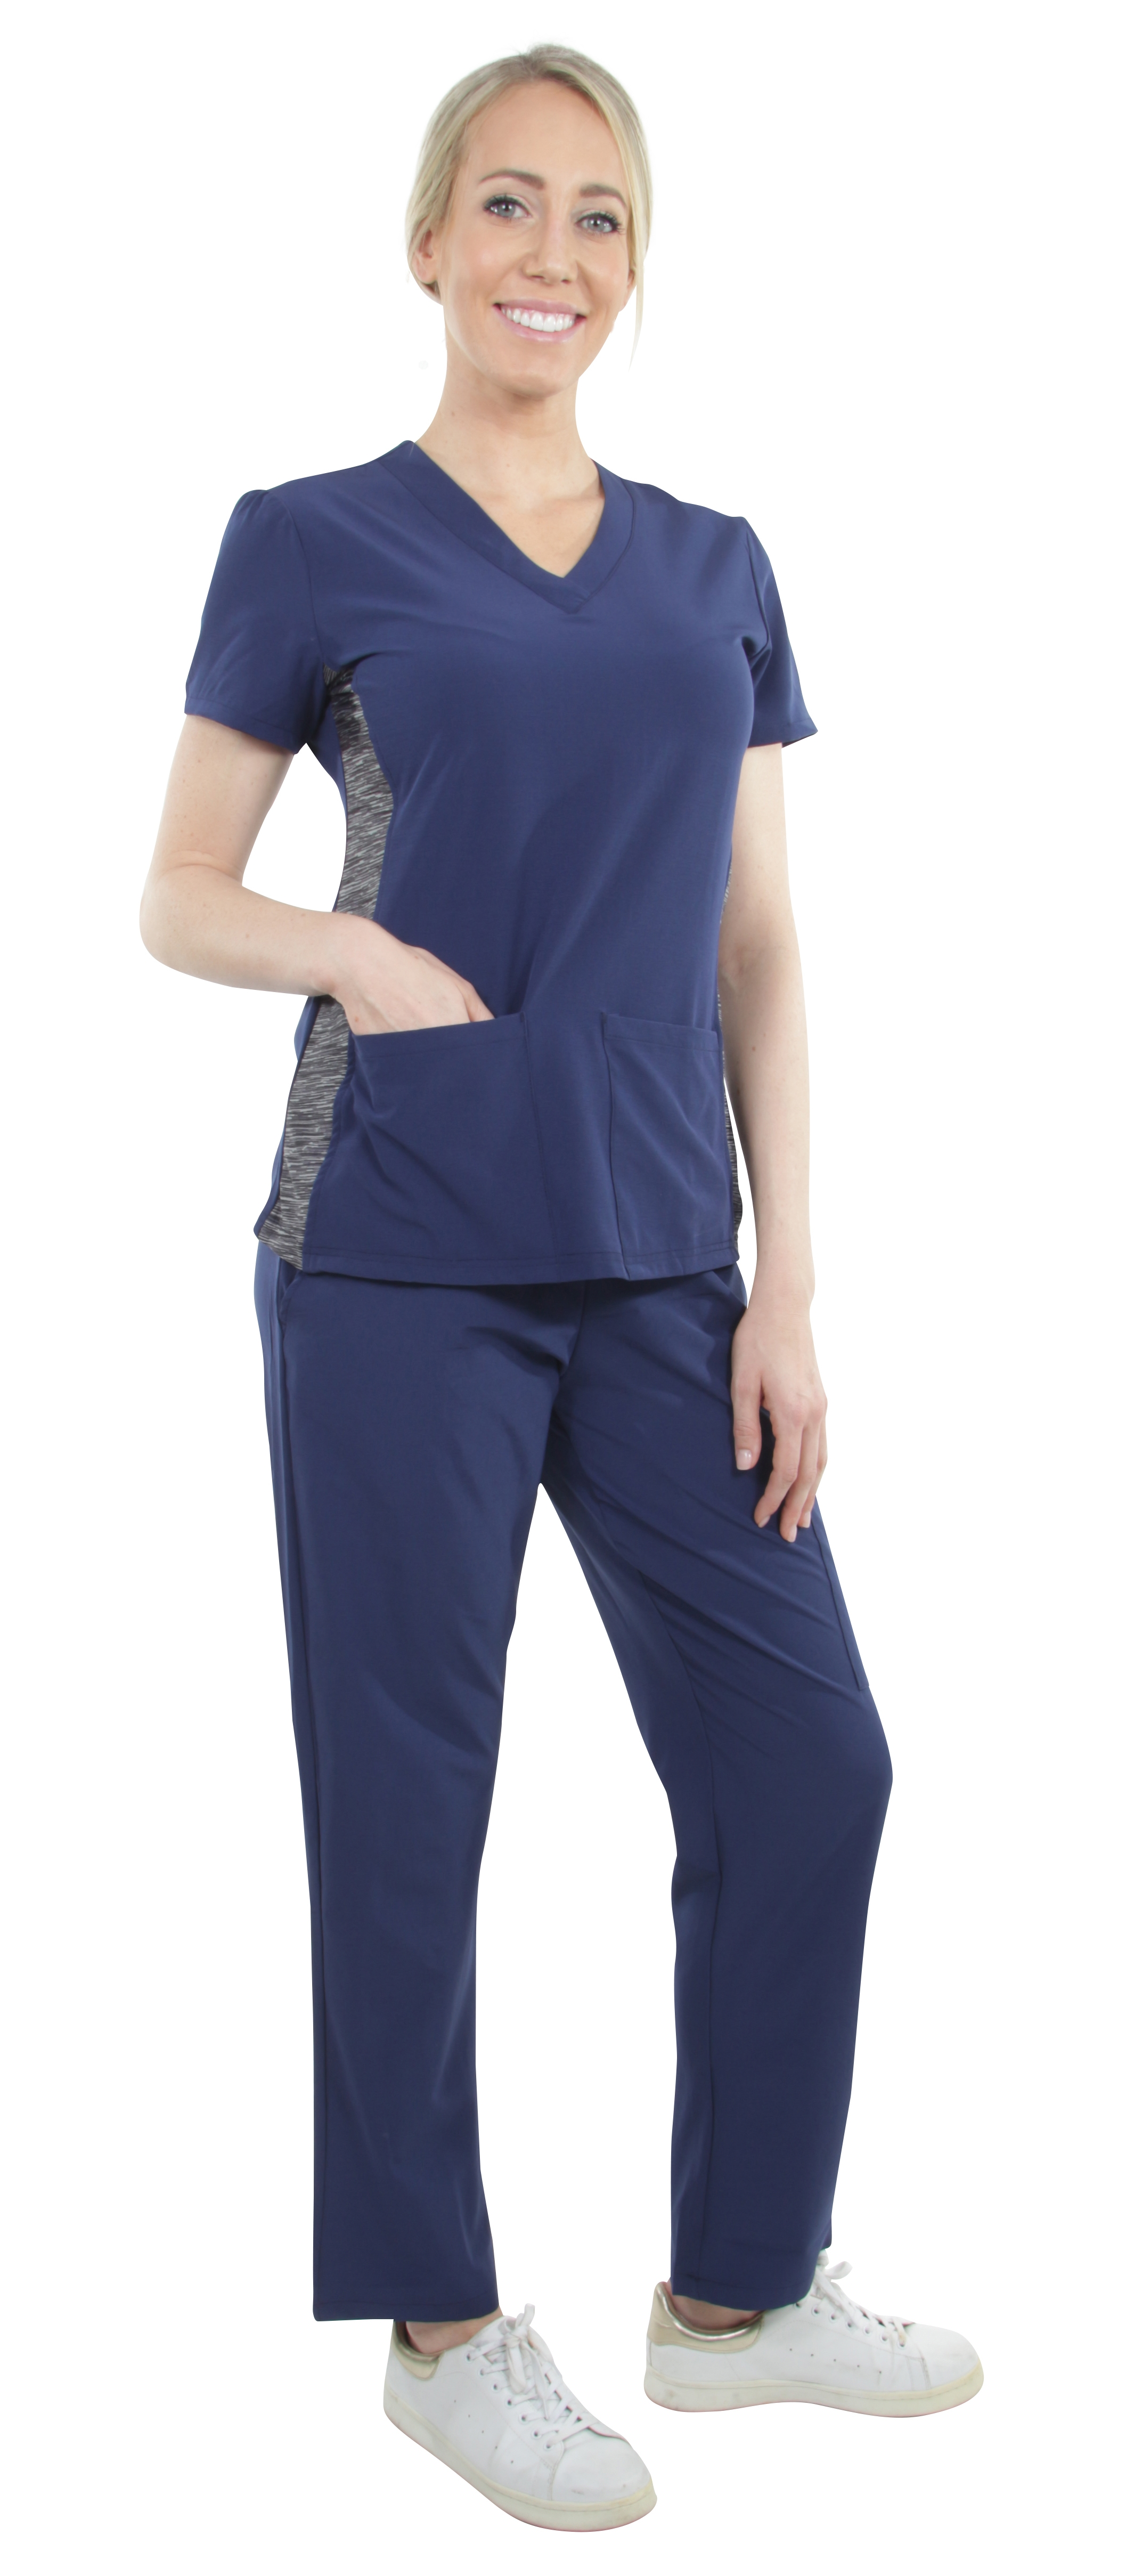 Unisex-Performance-Stretch-Medical-Uniform-Five-Pockets-V-Neck-Scrubs-Sets miniature 33